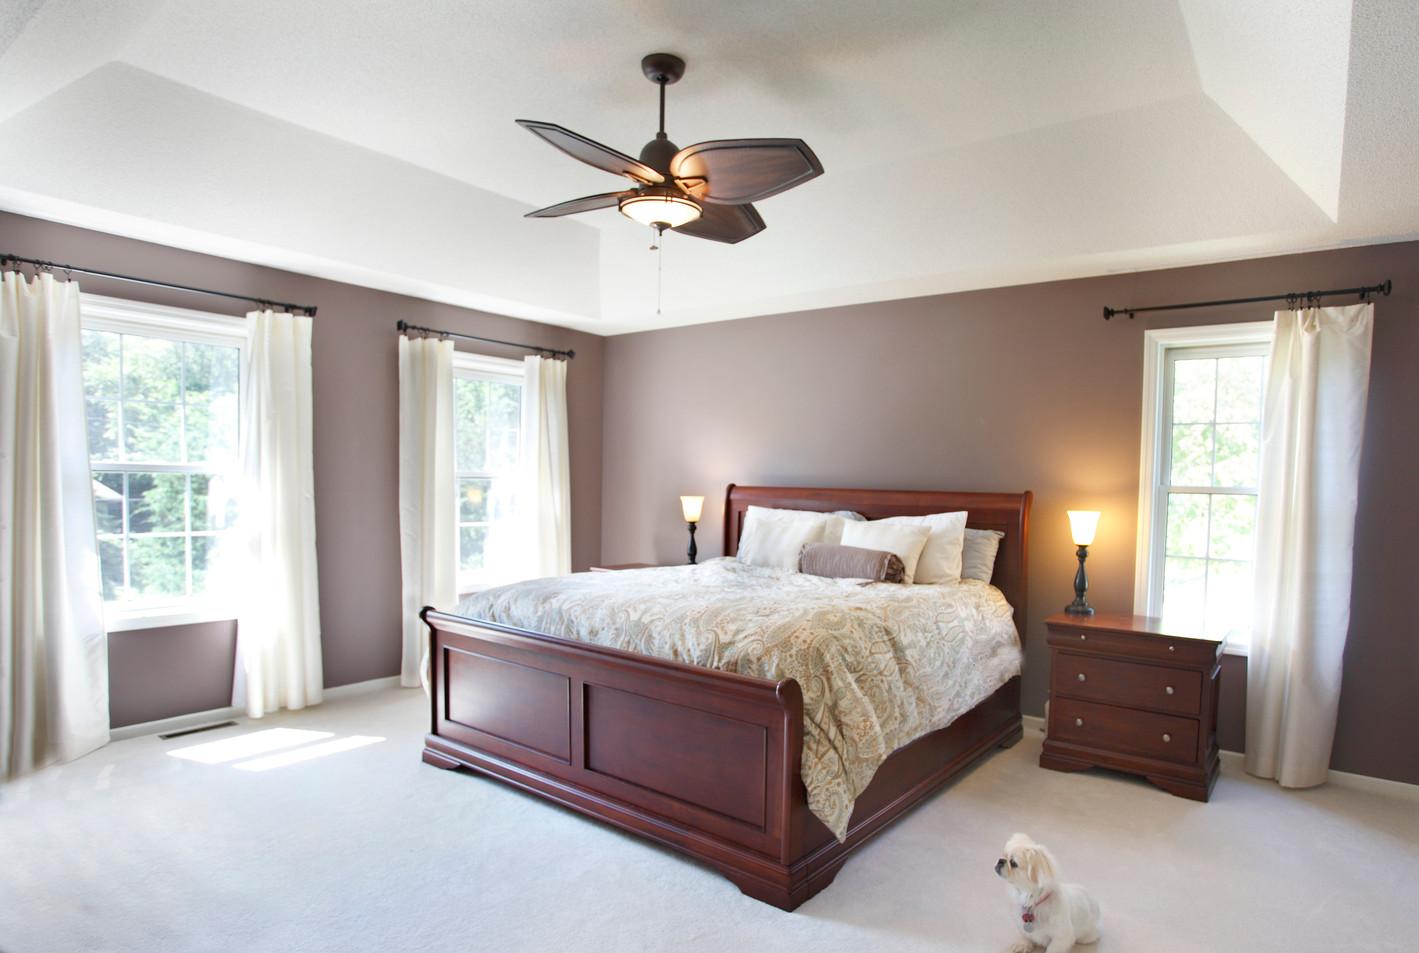 Rc_5721_Master Bedroom.jpg